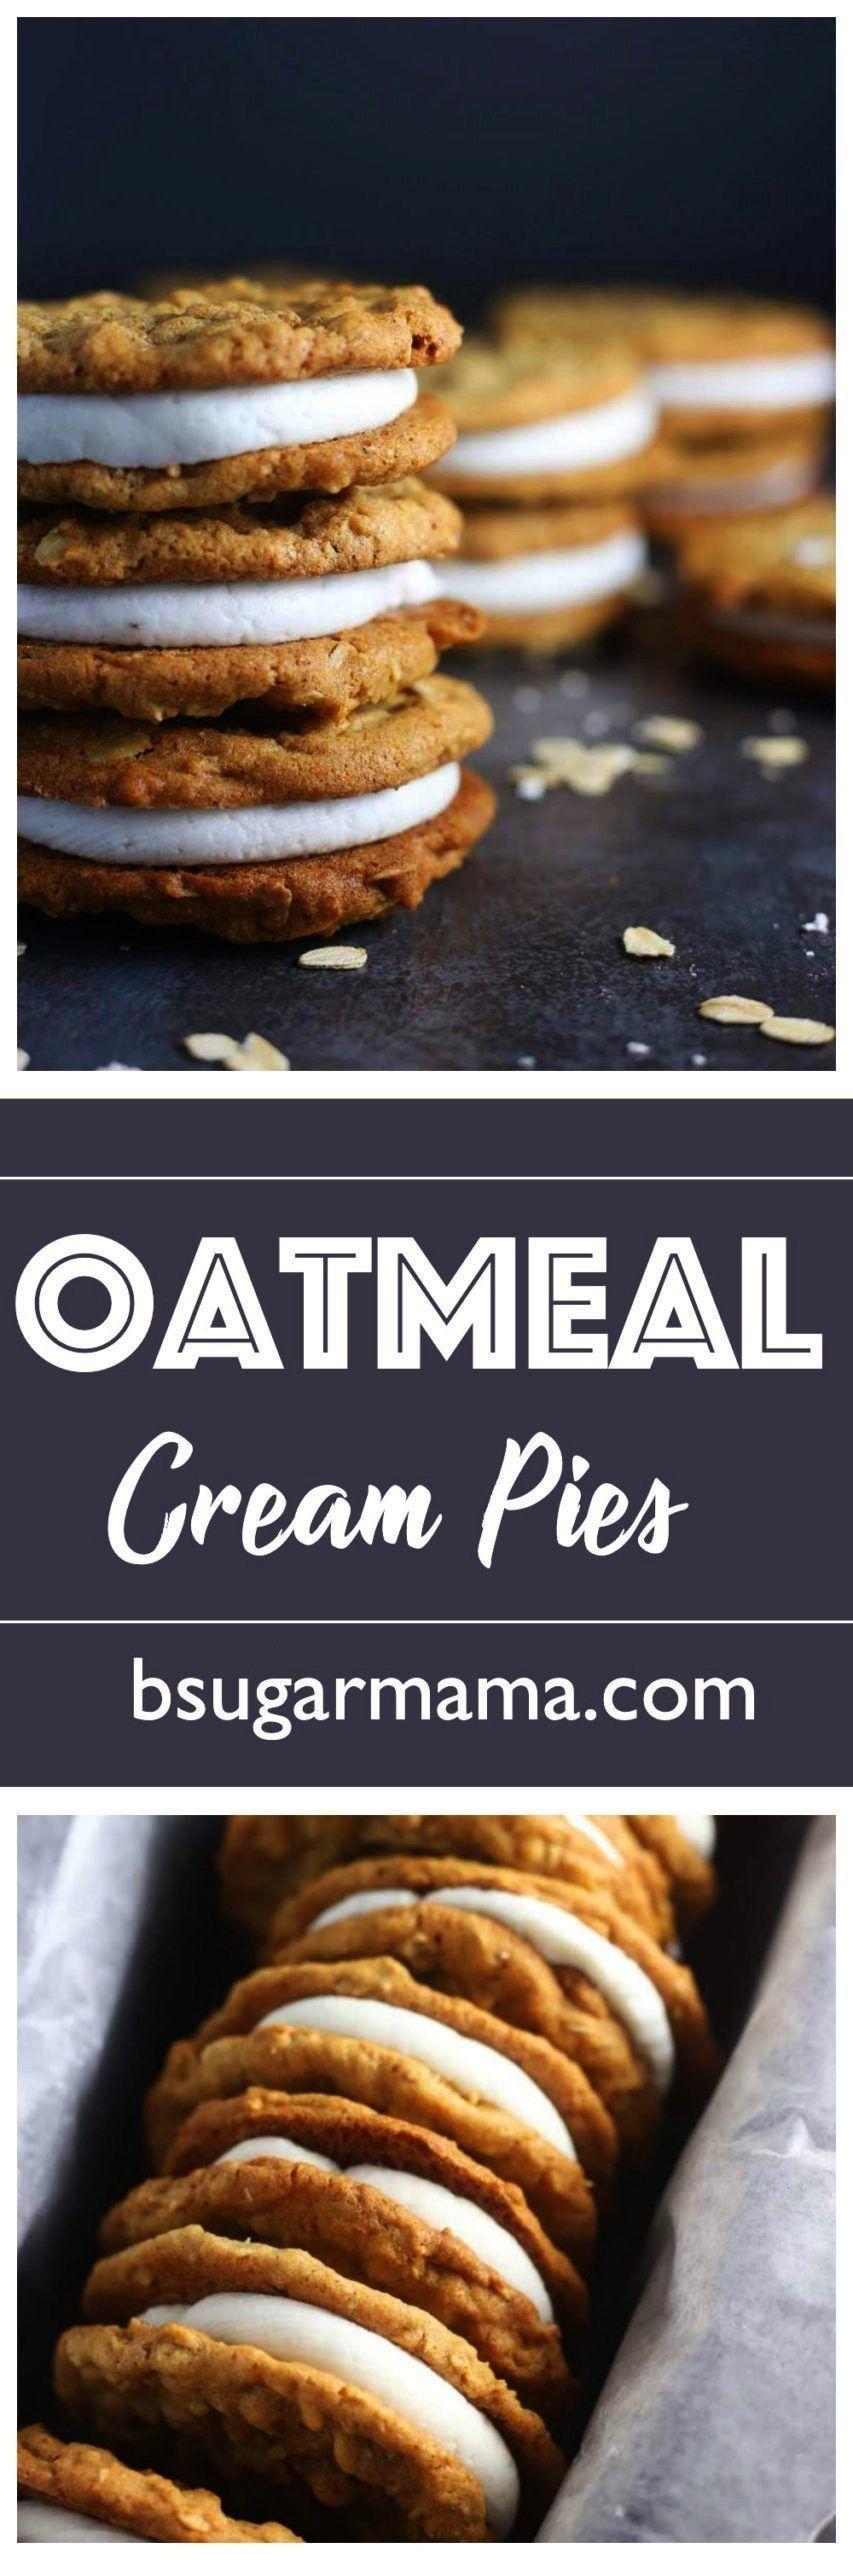 Oatmeal Cream Pies | Brown Sugar Food Blog Homemade Oatmeal Cream Pies:Homemade Oatmeal Cream Pies: